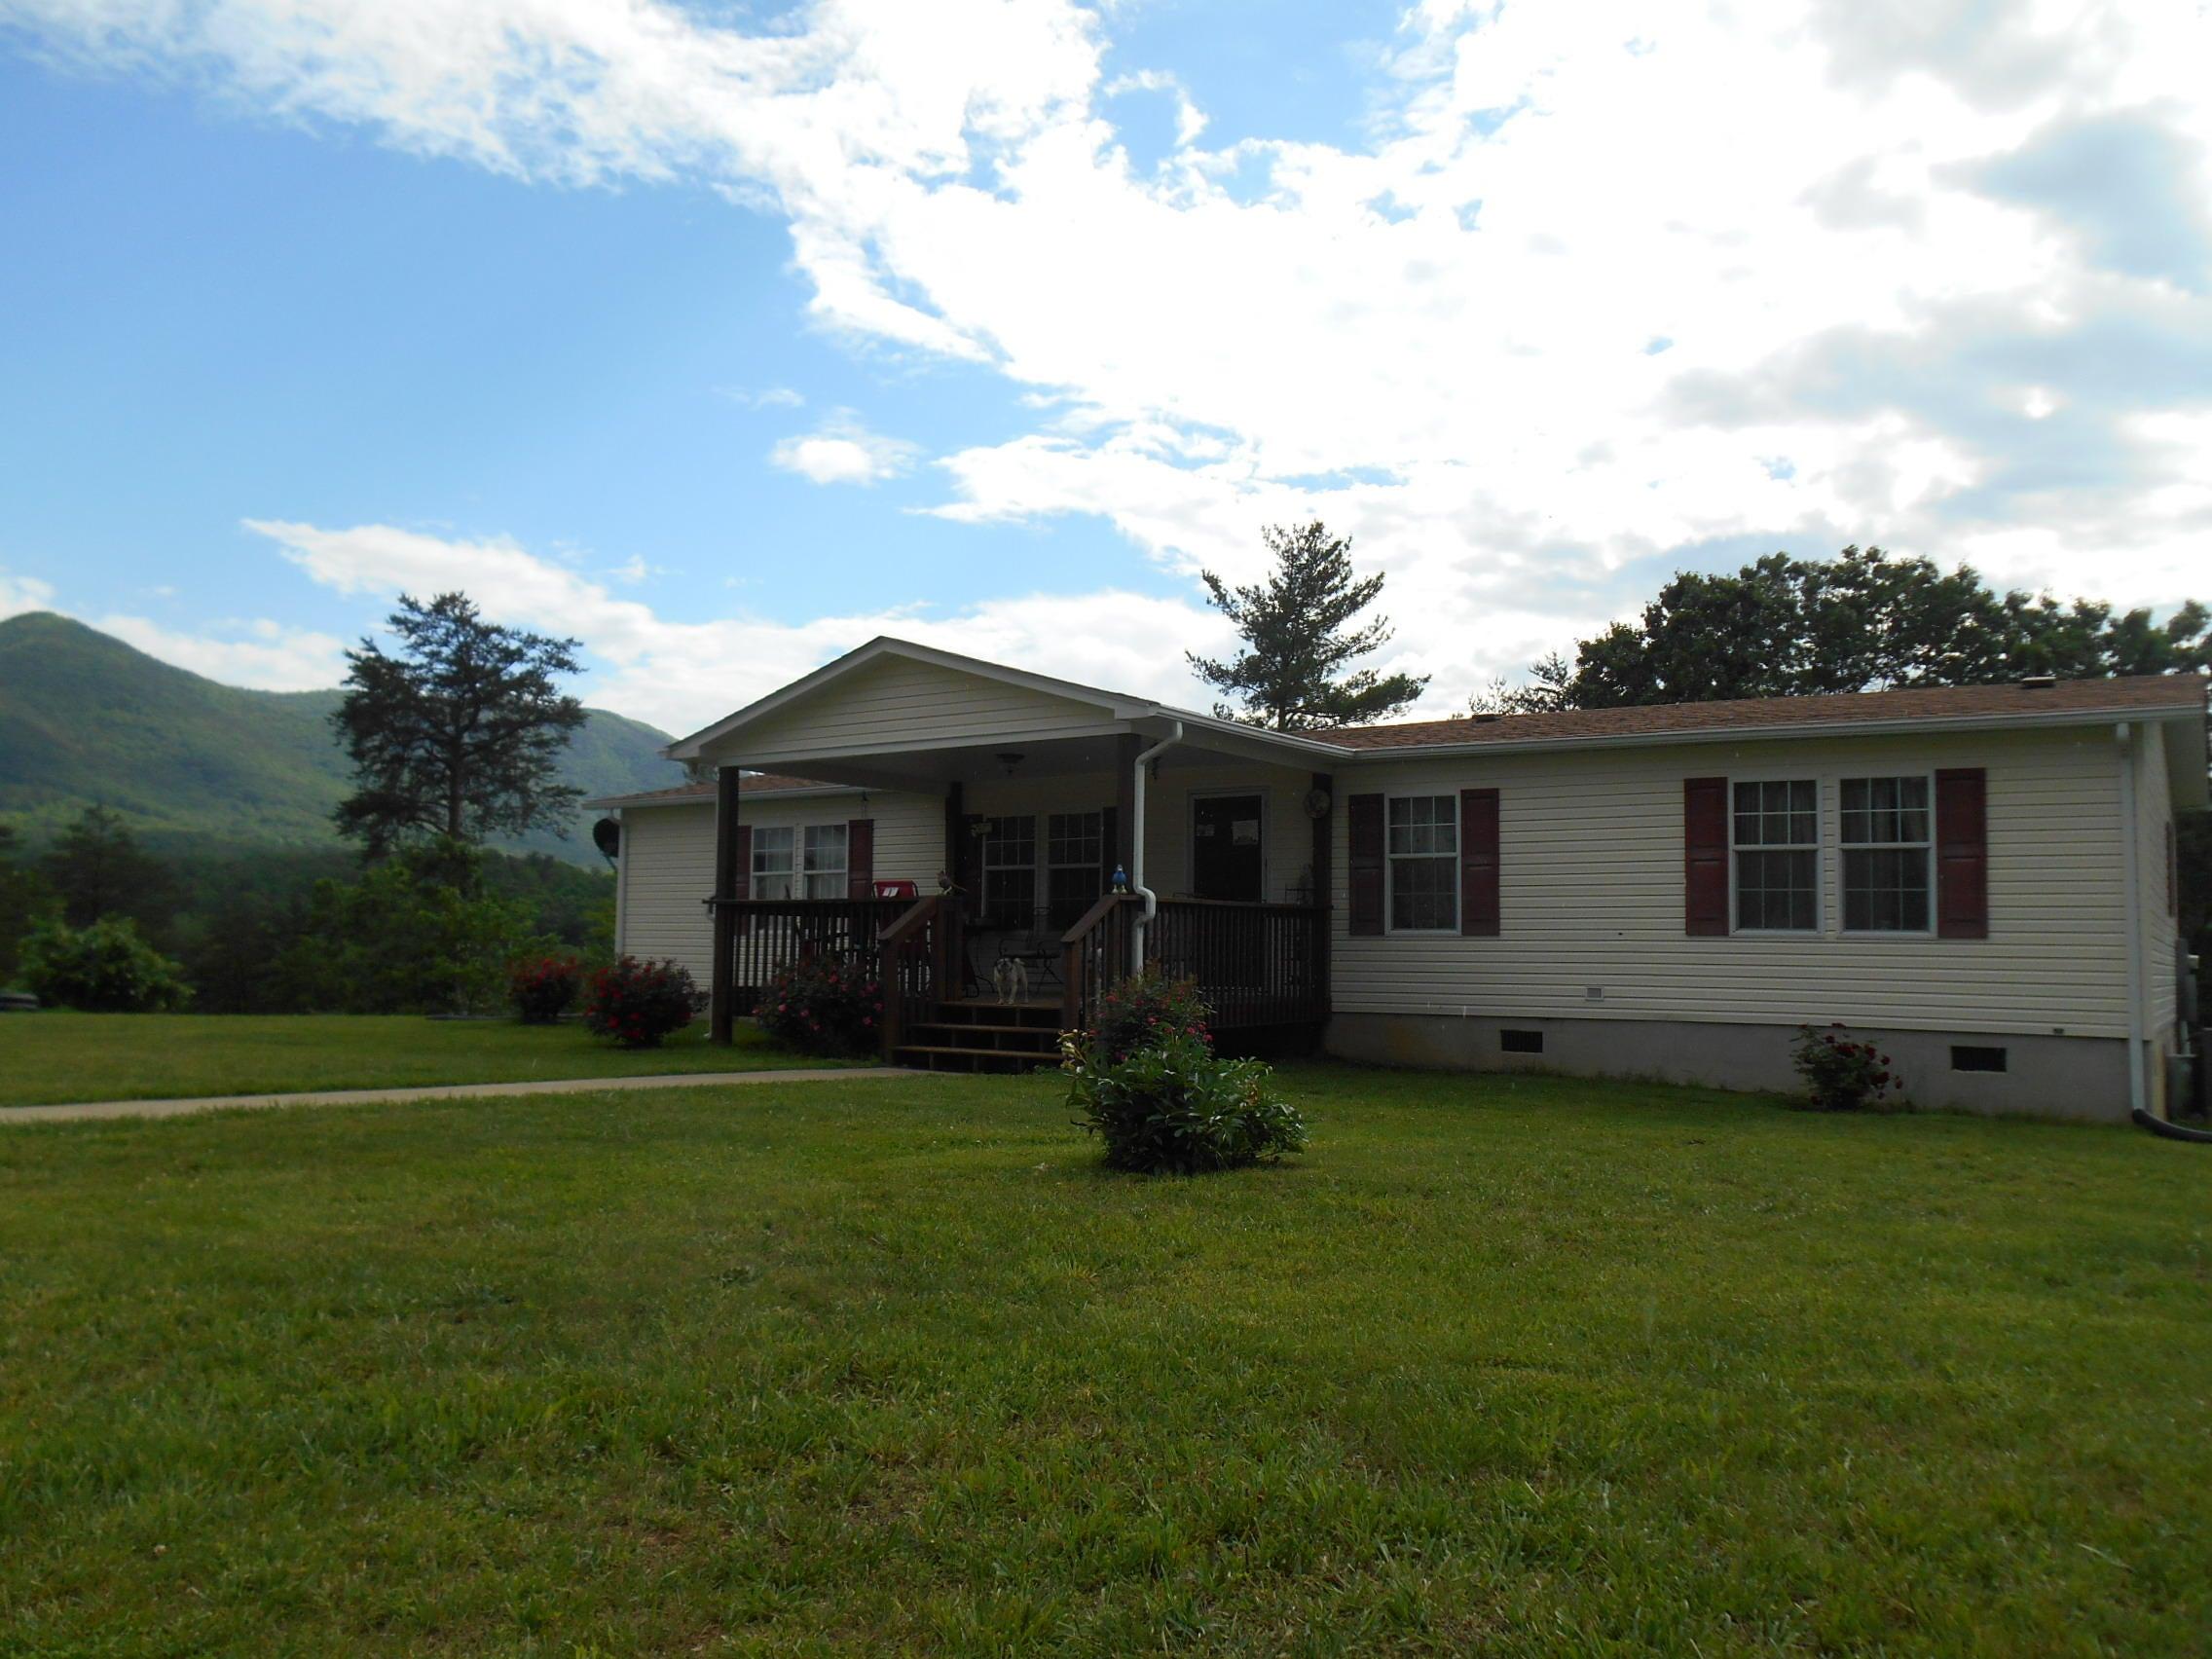 6202 DRY HOLLOW RD, Salem, VA 24153